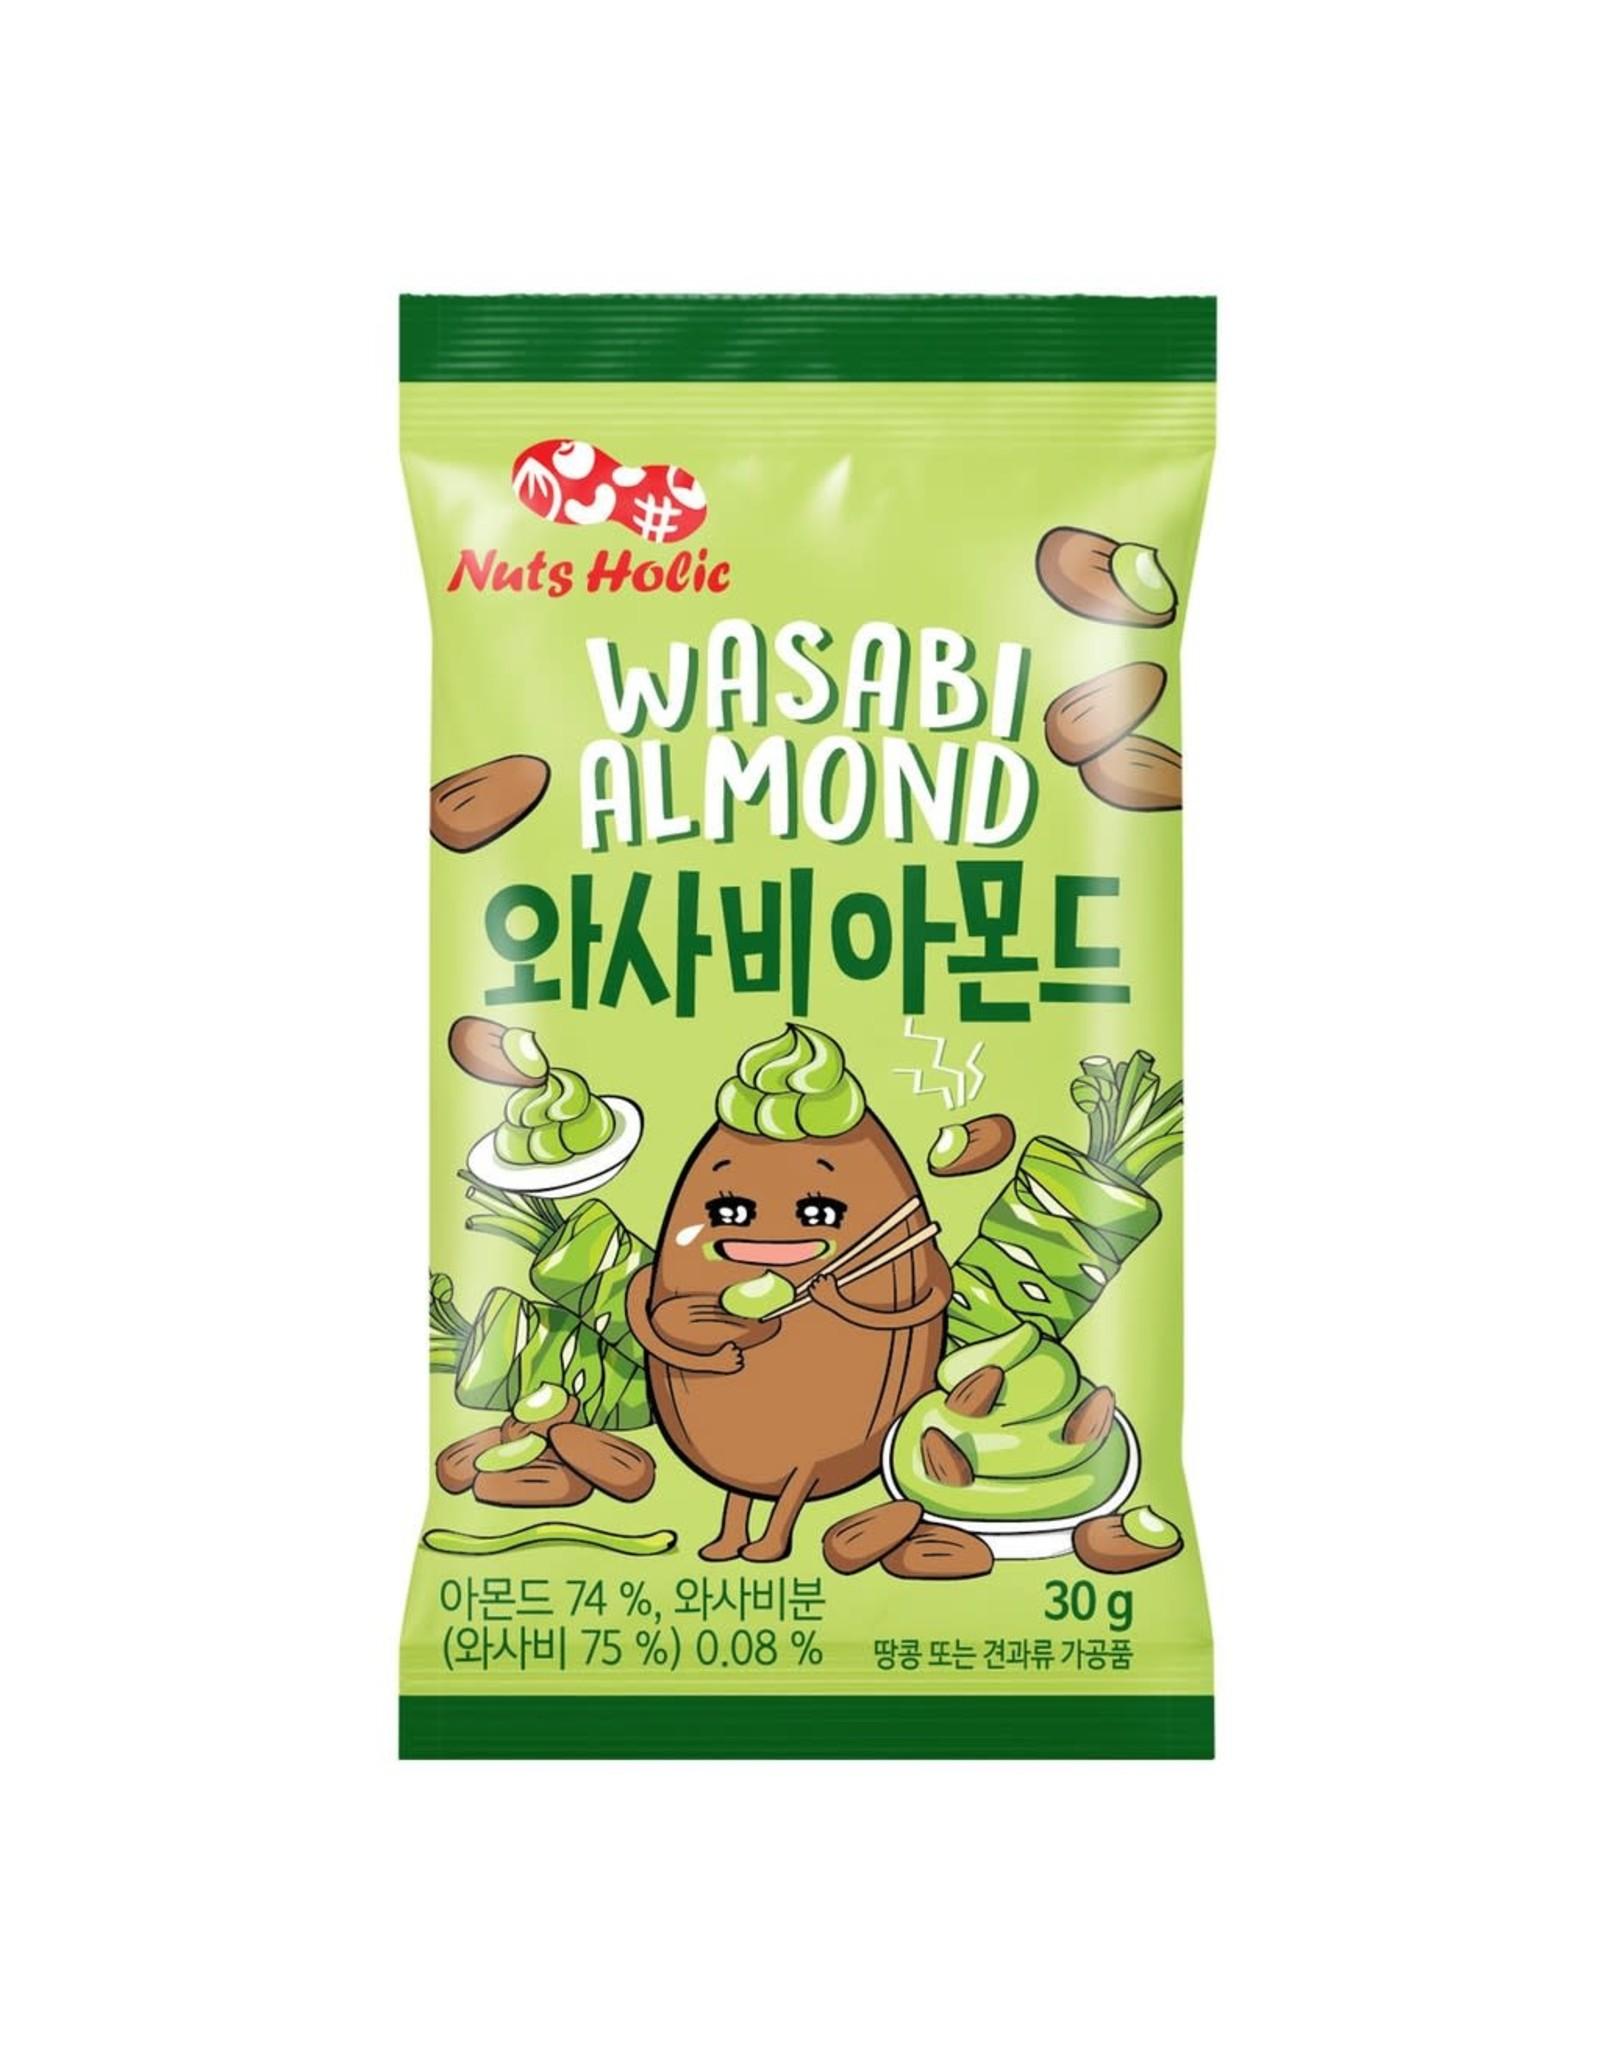 NutsHolic - Wasabi Almonds - 30g